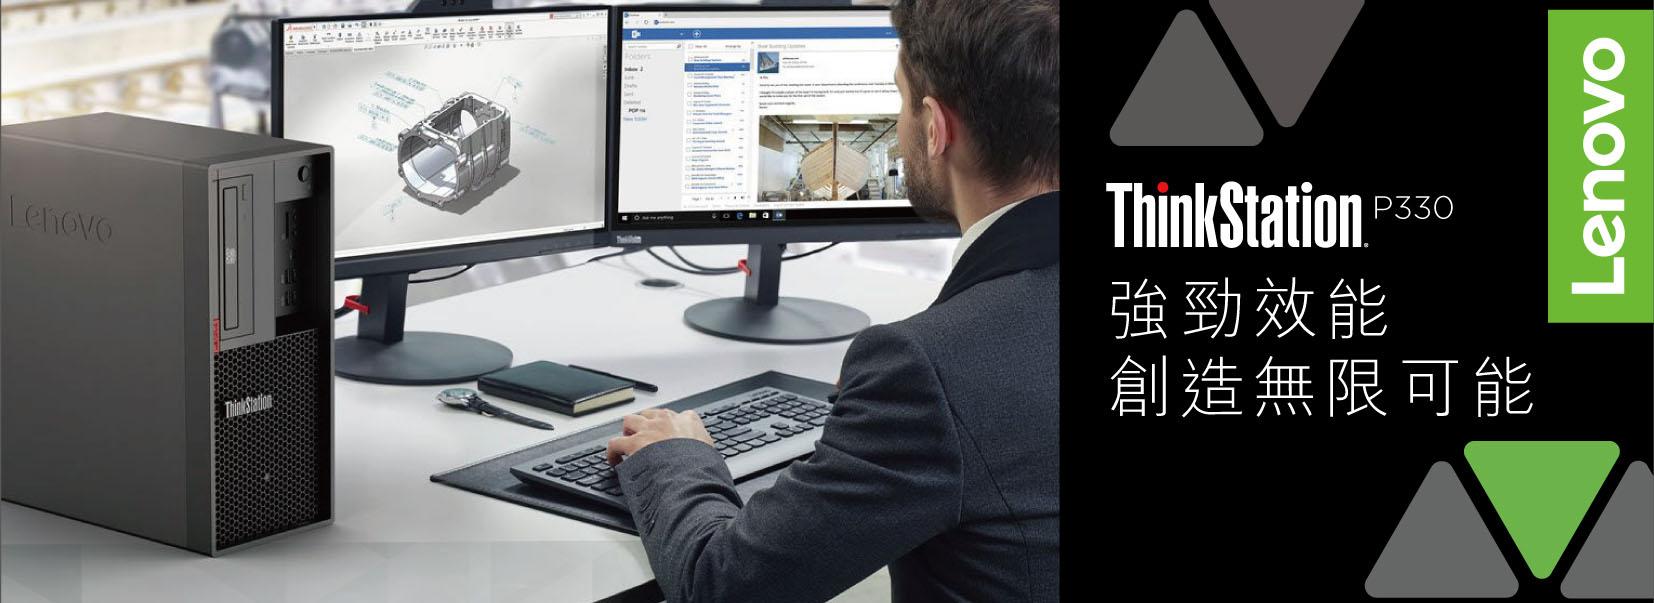 Lenovo_ThinkStationP330Tower_T1_Promo